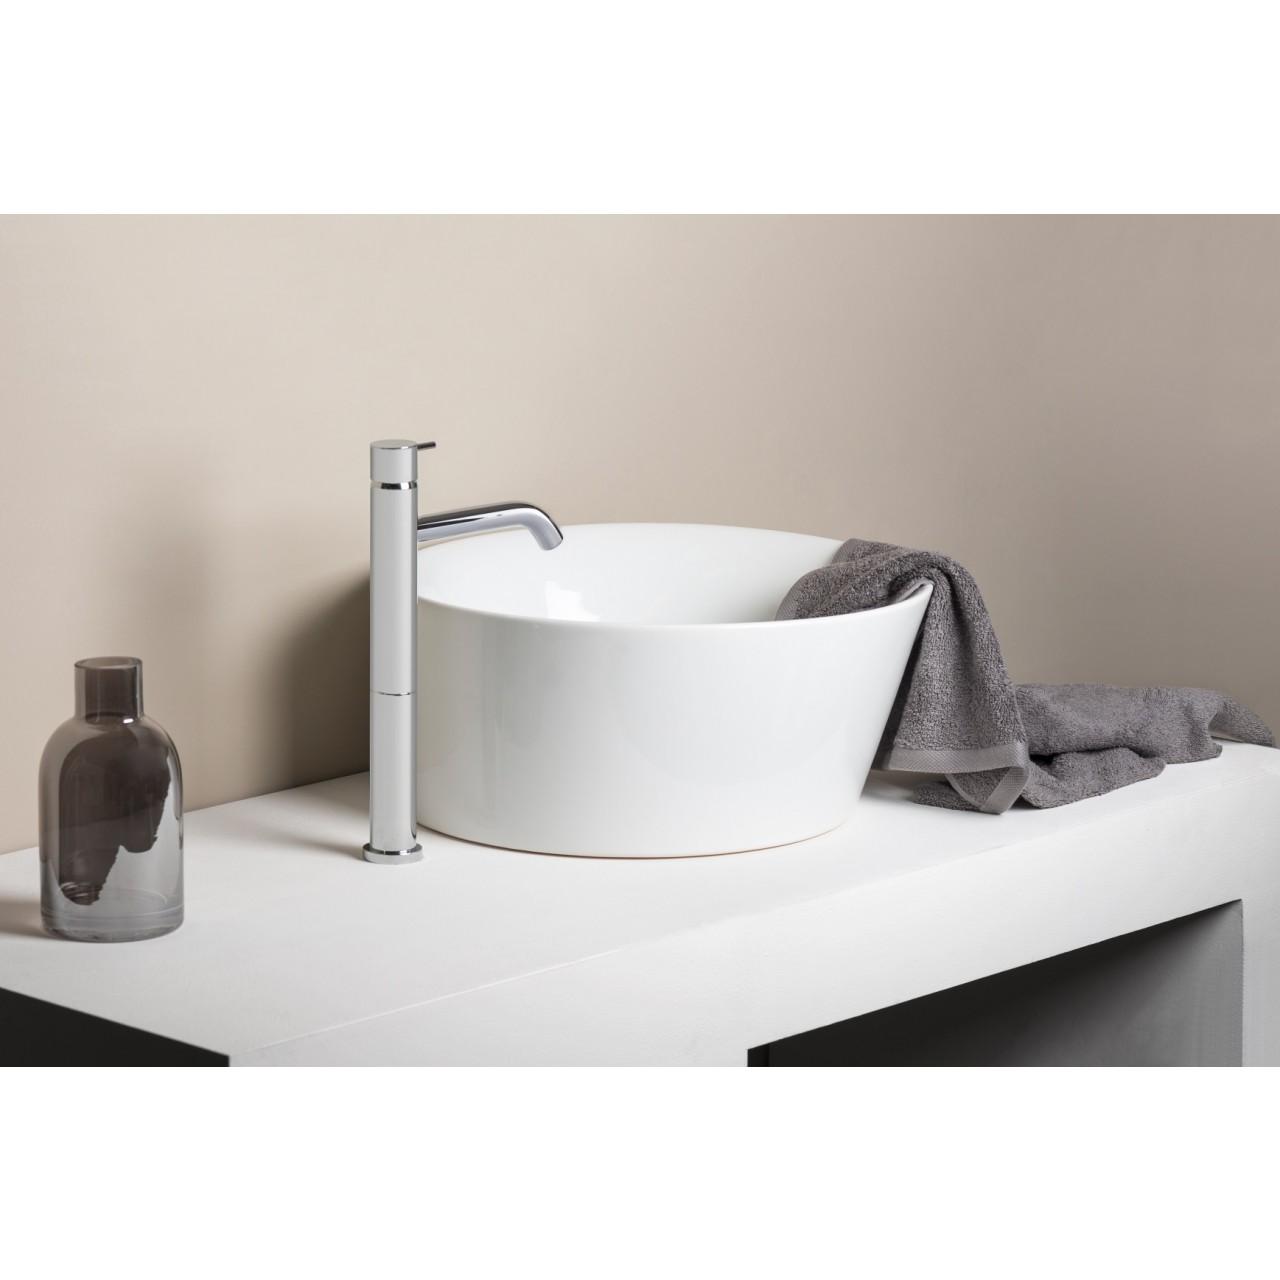 Diametro35 - Exposed Single Lever Basin Mixer